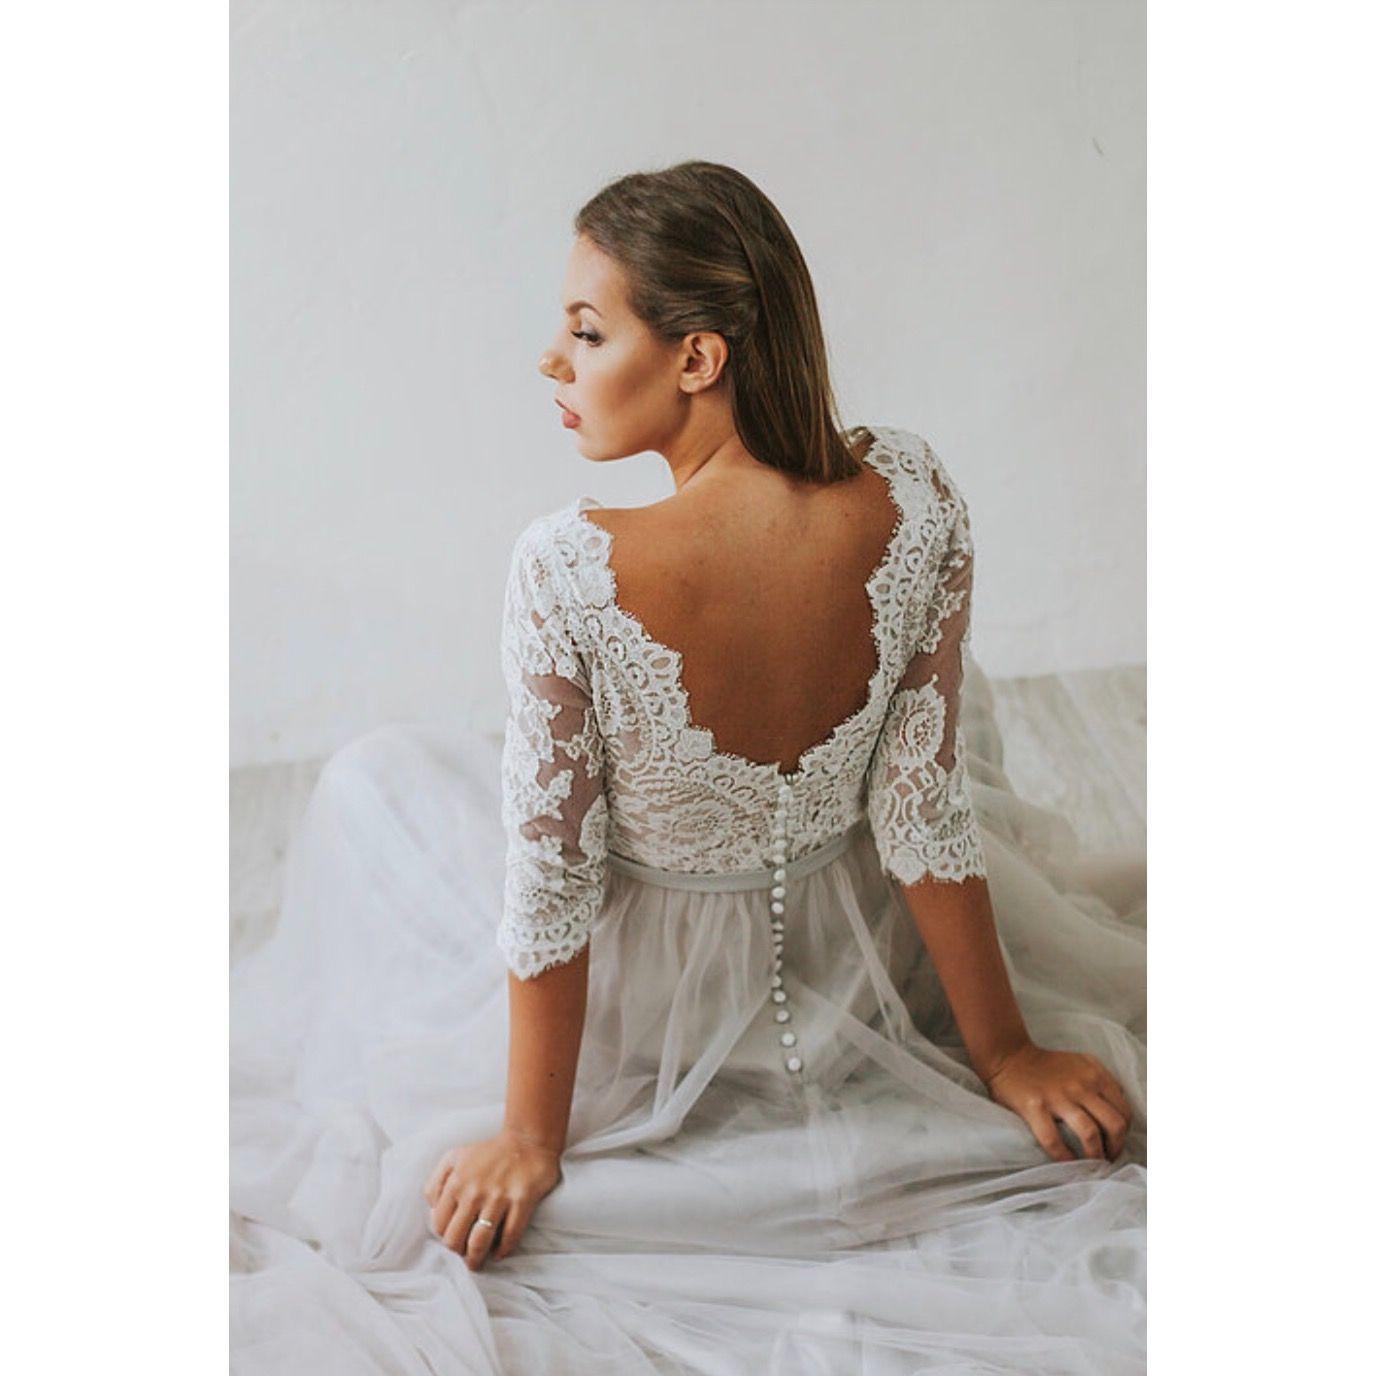 Anna Johnson AS Dress Store